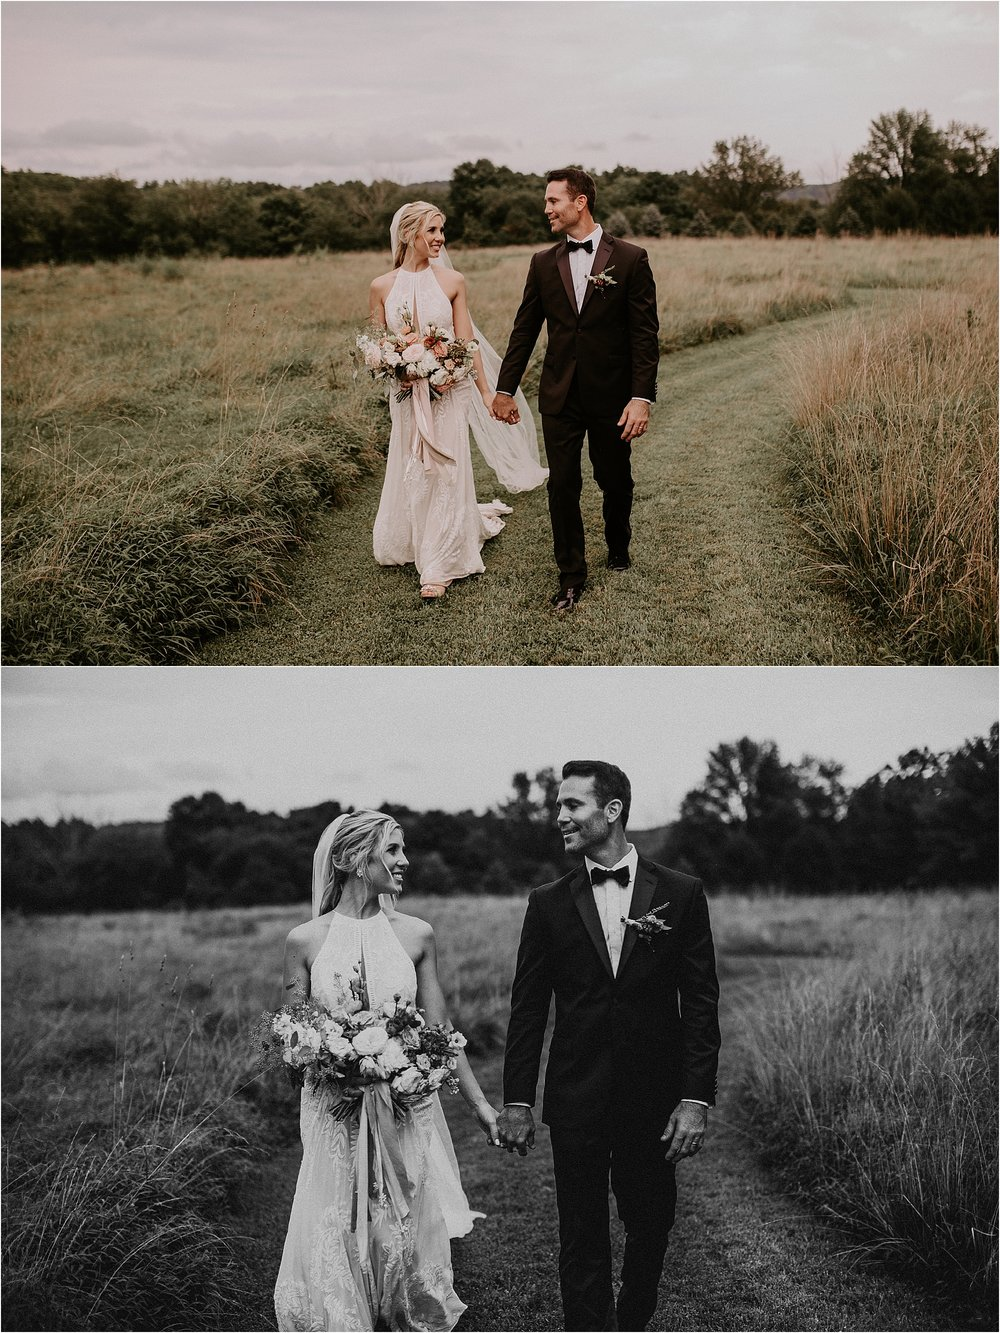 Sarah_Brookhart_Hortulus_Farm_Garden_and_Nursey_Wedding_Photographer_0054.jpg